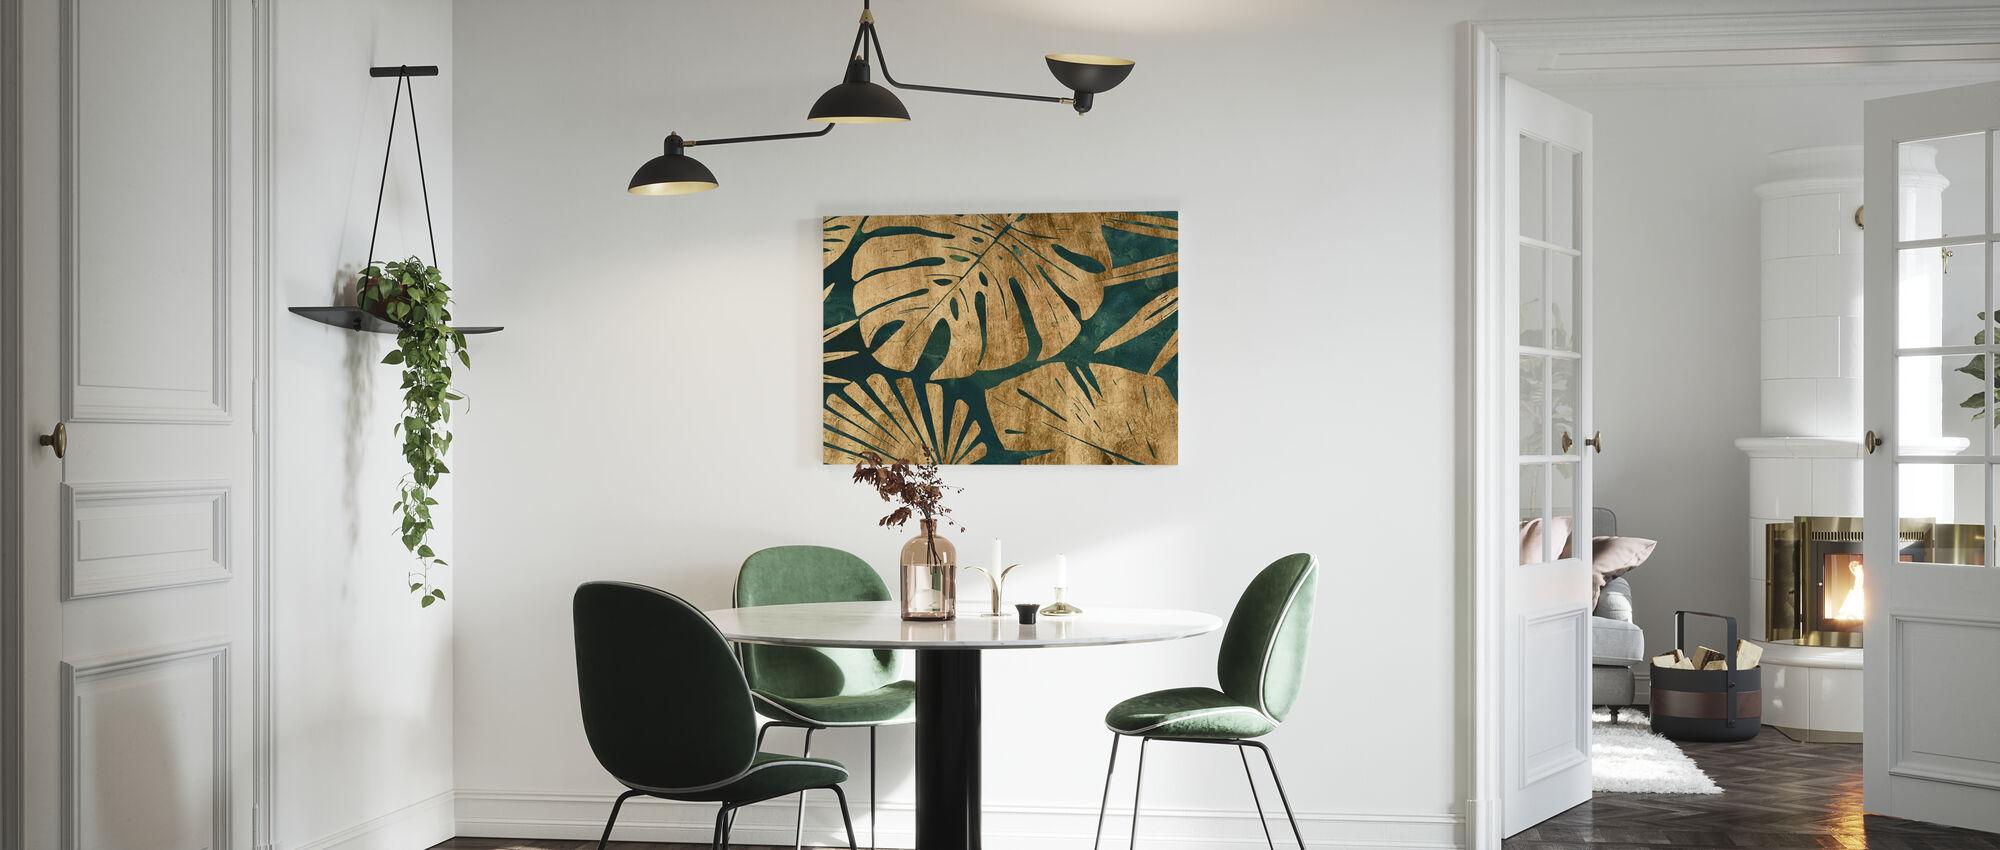 Smaragd djungel - Canvastavla - Kök